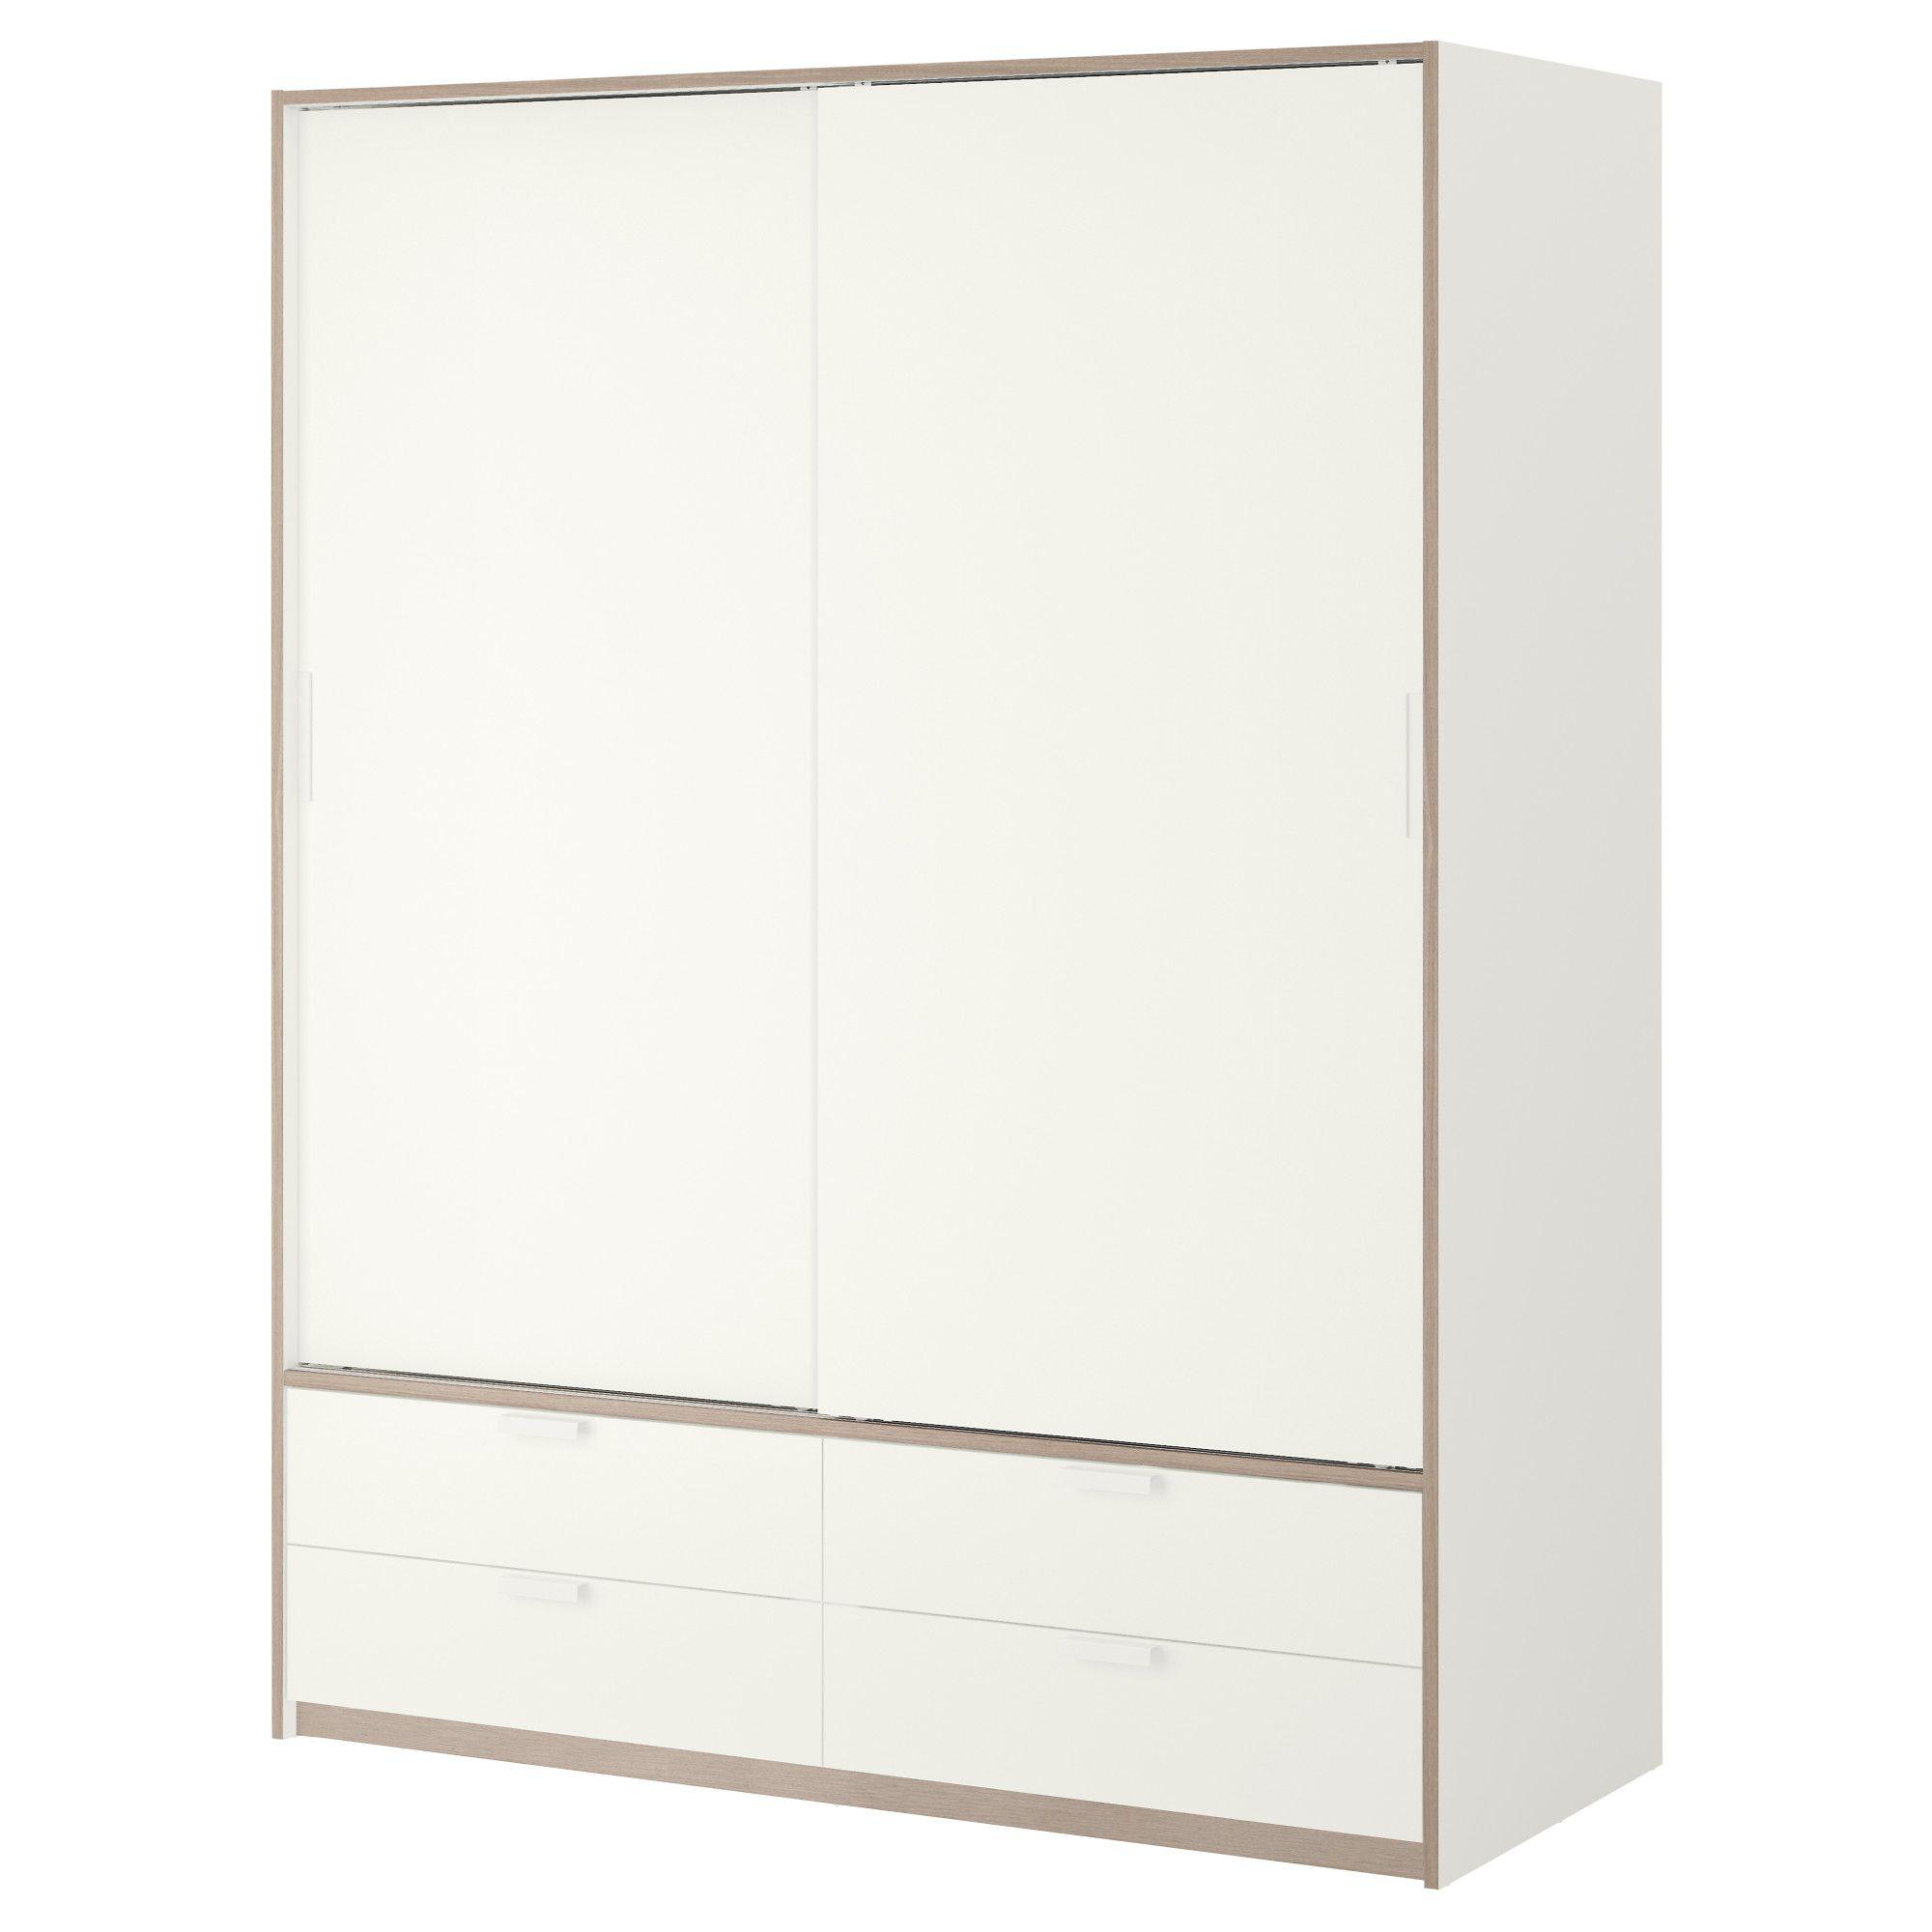 IKEA - TRYSIL, Armario+puerta corredera, blanco/gris claro, , Las ...